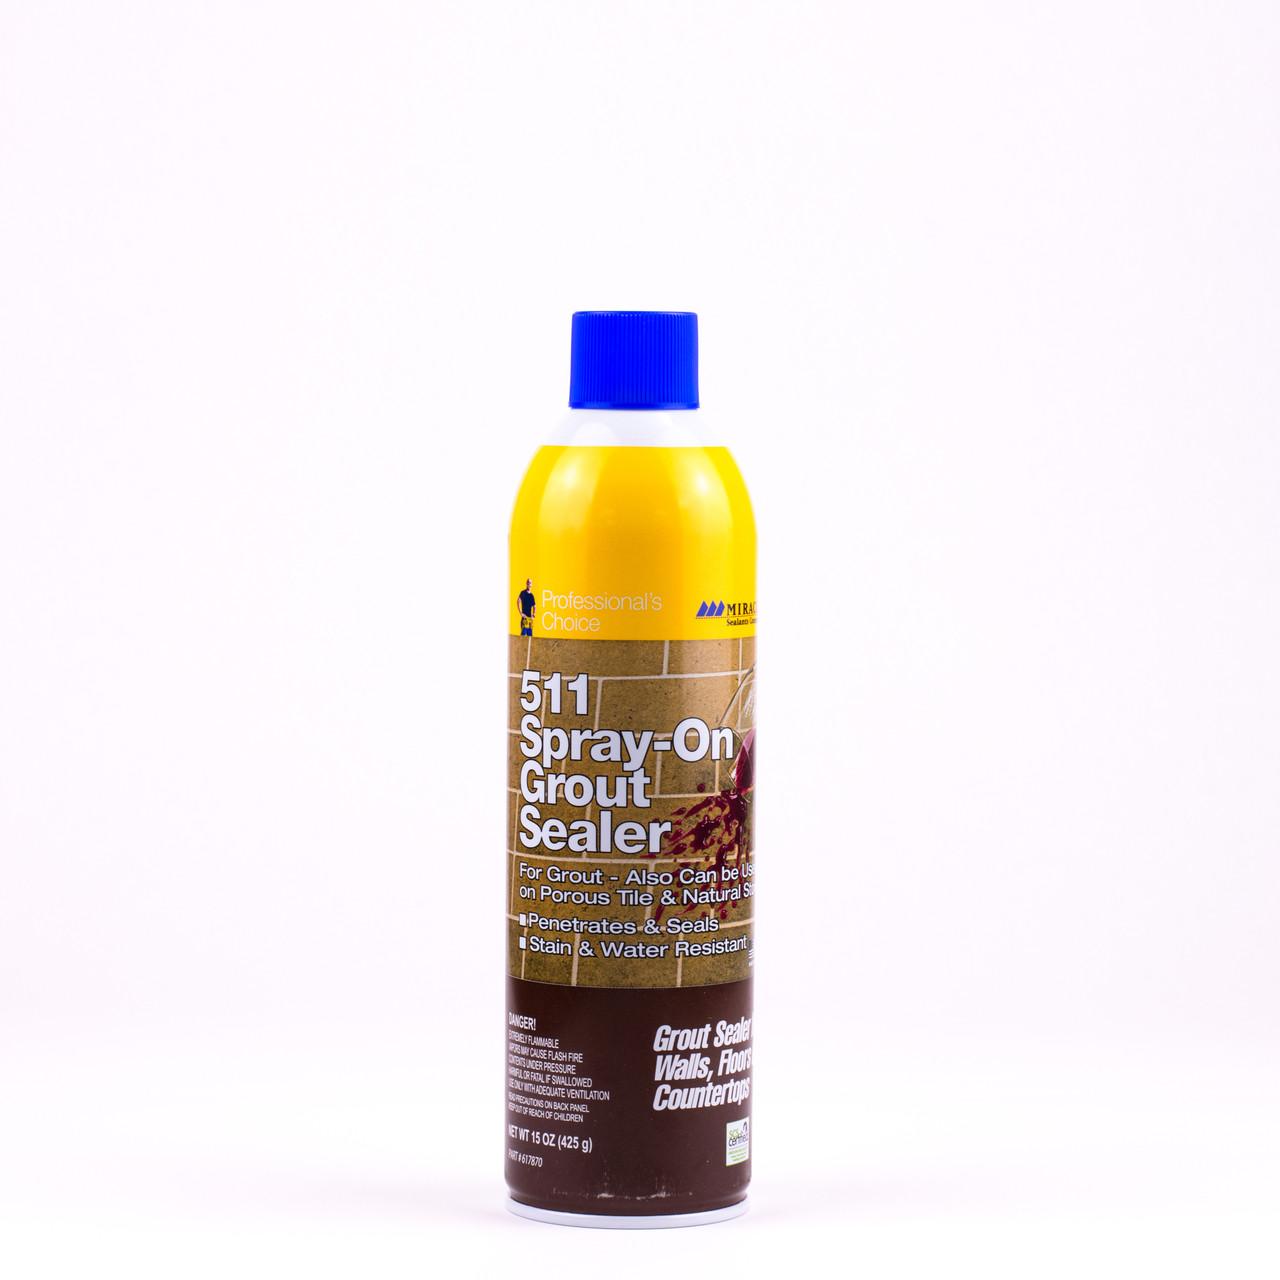 - 511 Spray-On Grout Sealer Aerosol Spray - Tiles Direct Store